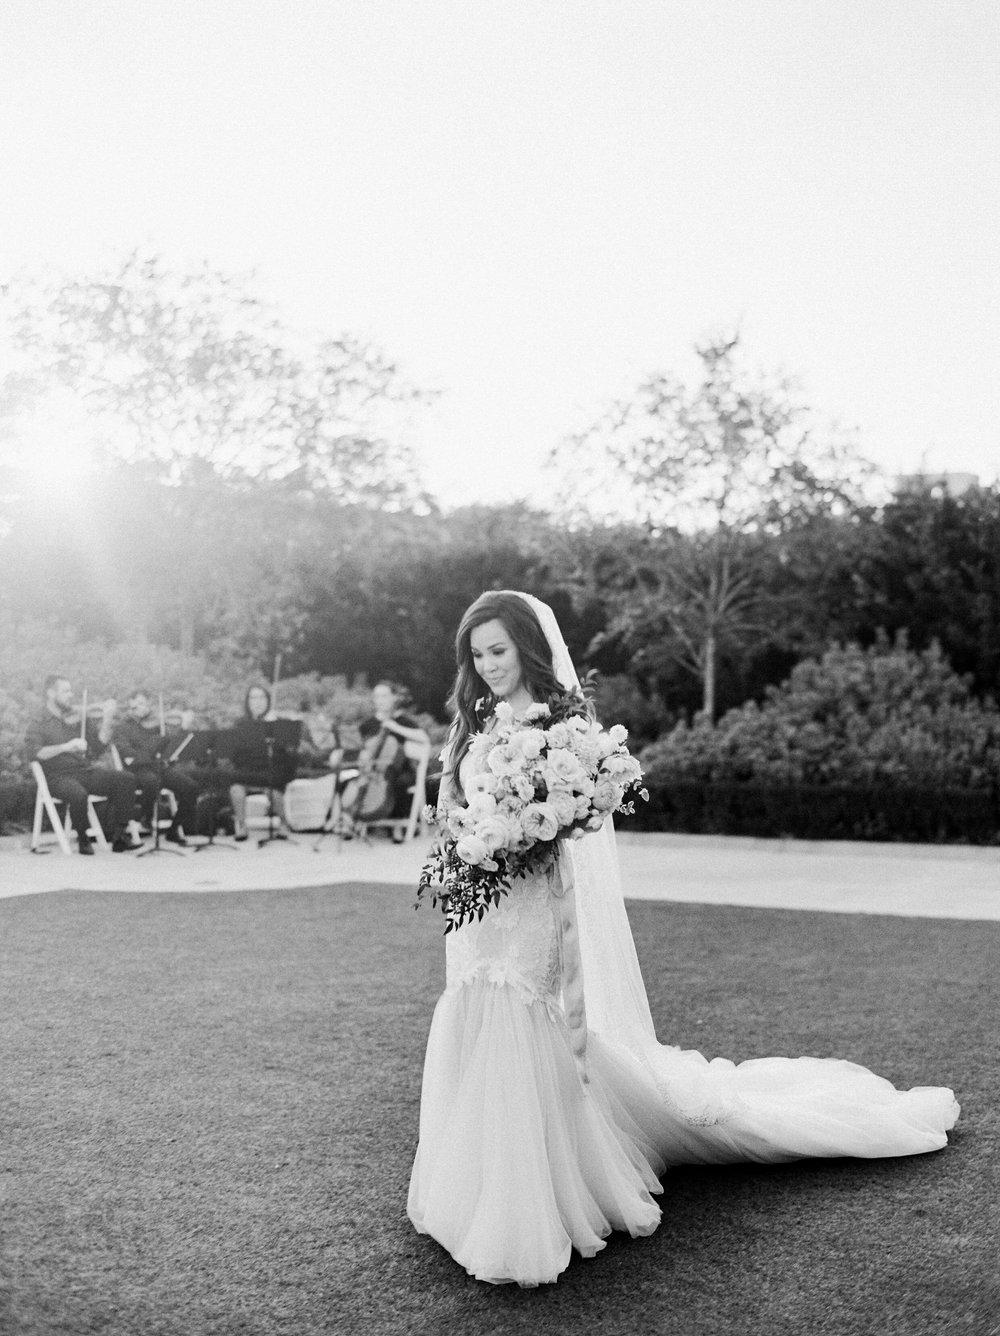 Martha-Stewart-Wedding-Dana-Fernandez-Photography-Josh-Texas-Film-Houston-Wedding-Fine-Art-Photographer-McGovern-Centennial-Gardens-Top-Best-30.jpg